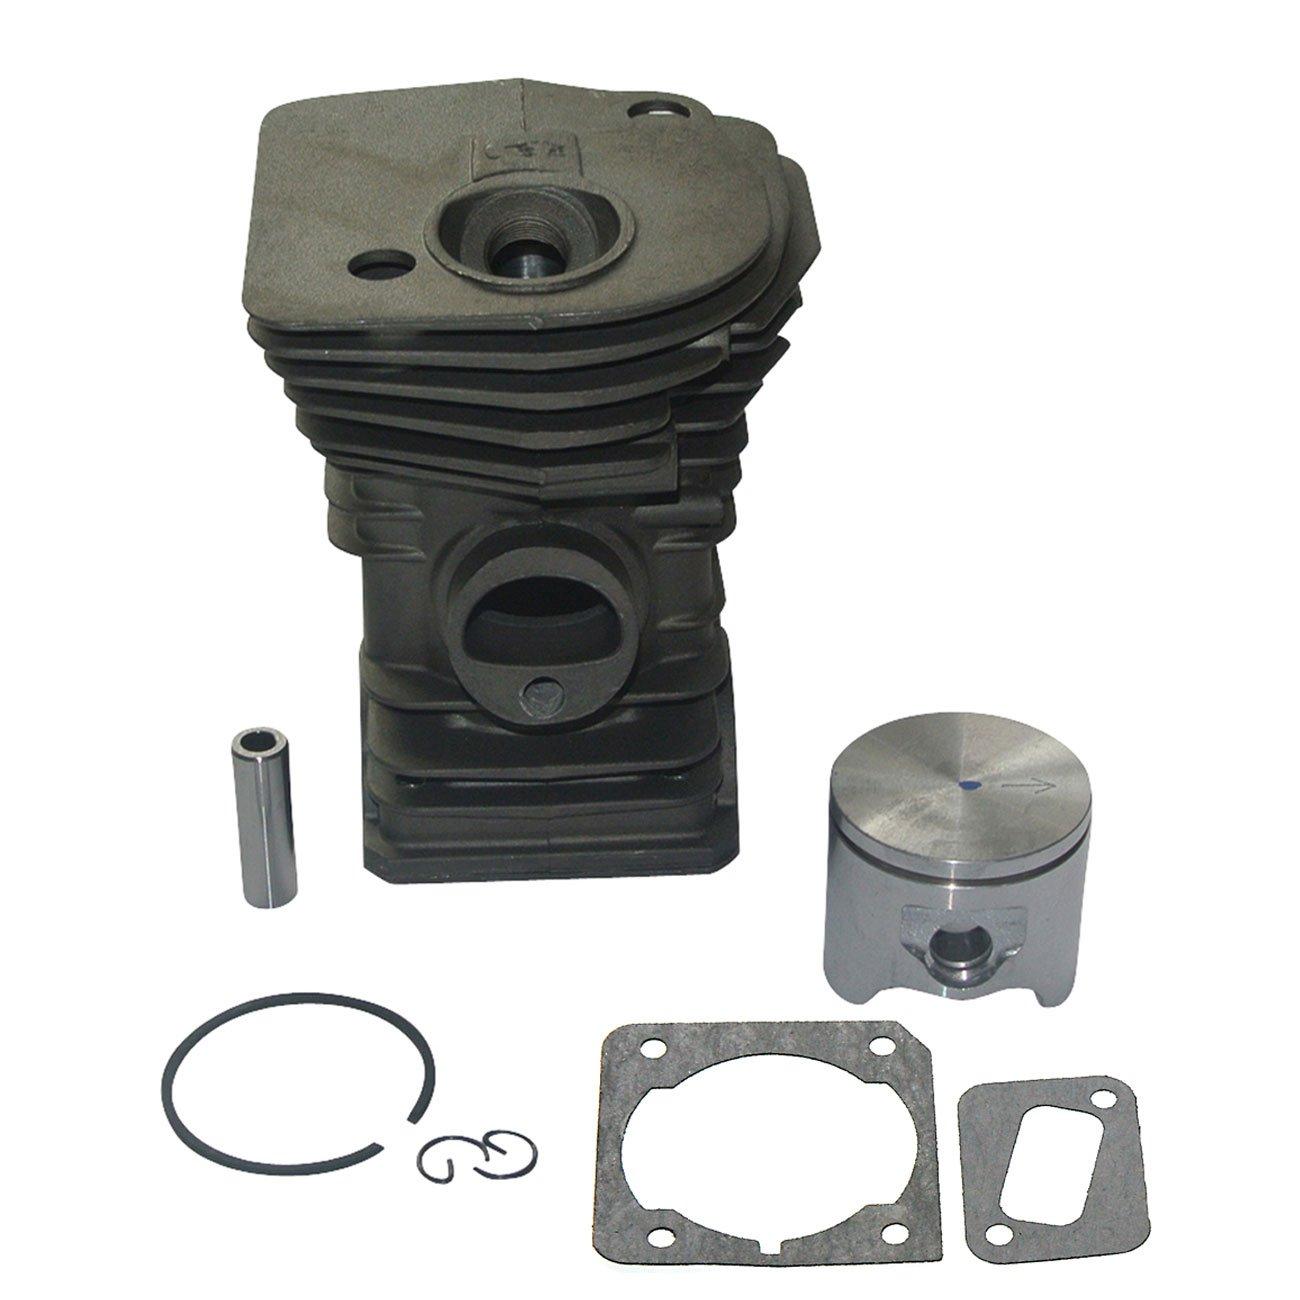 JRL Cylindre Moteur kit pour Husqvarna 340 345 tronç onneuse 42 mm Huang Machinery